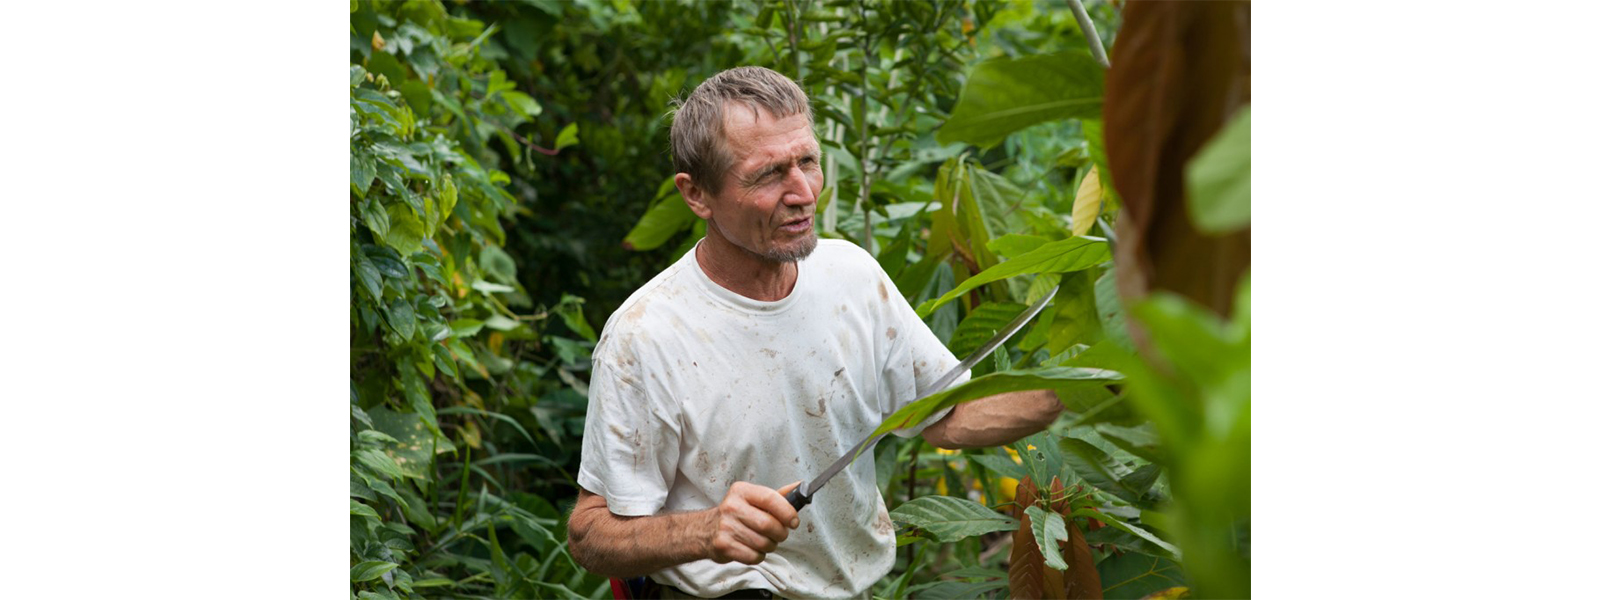 agrofloresta na bahia brasil com ernst